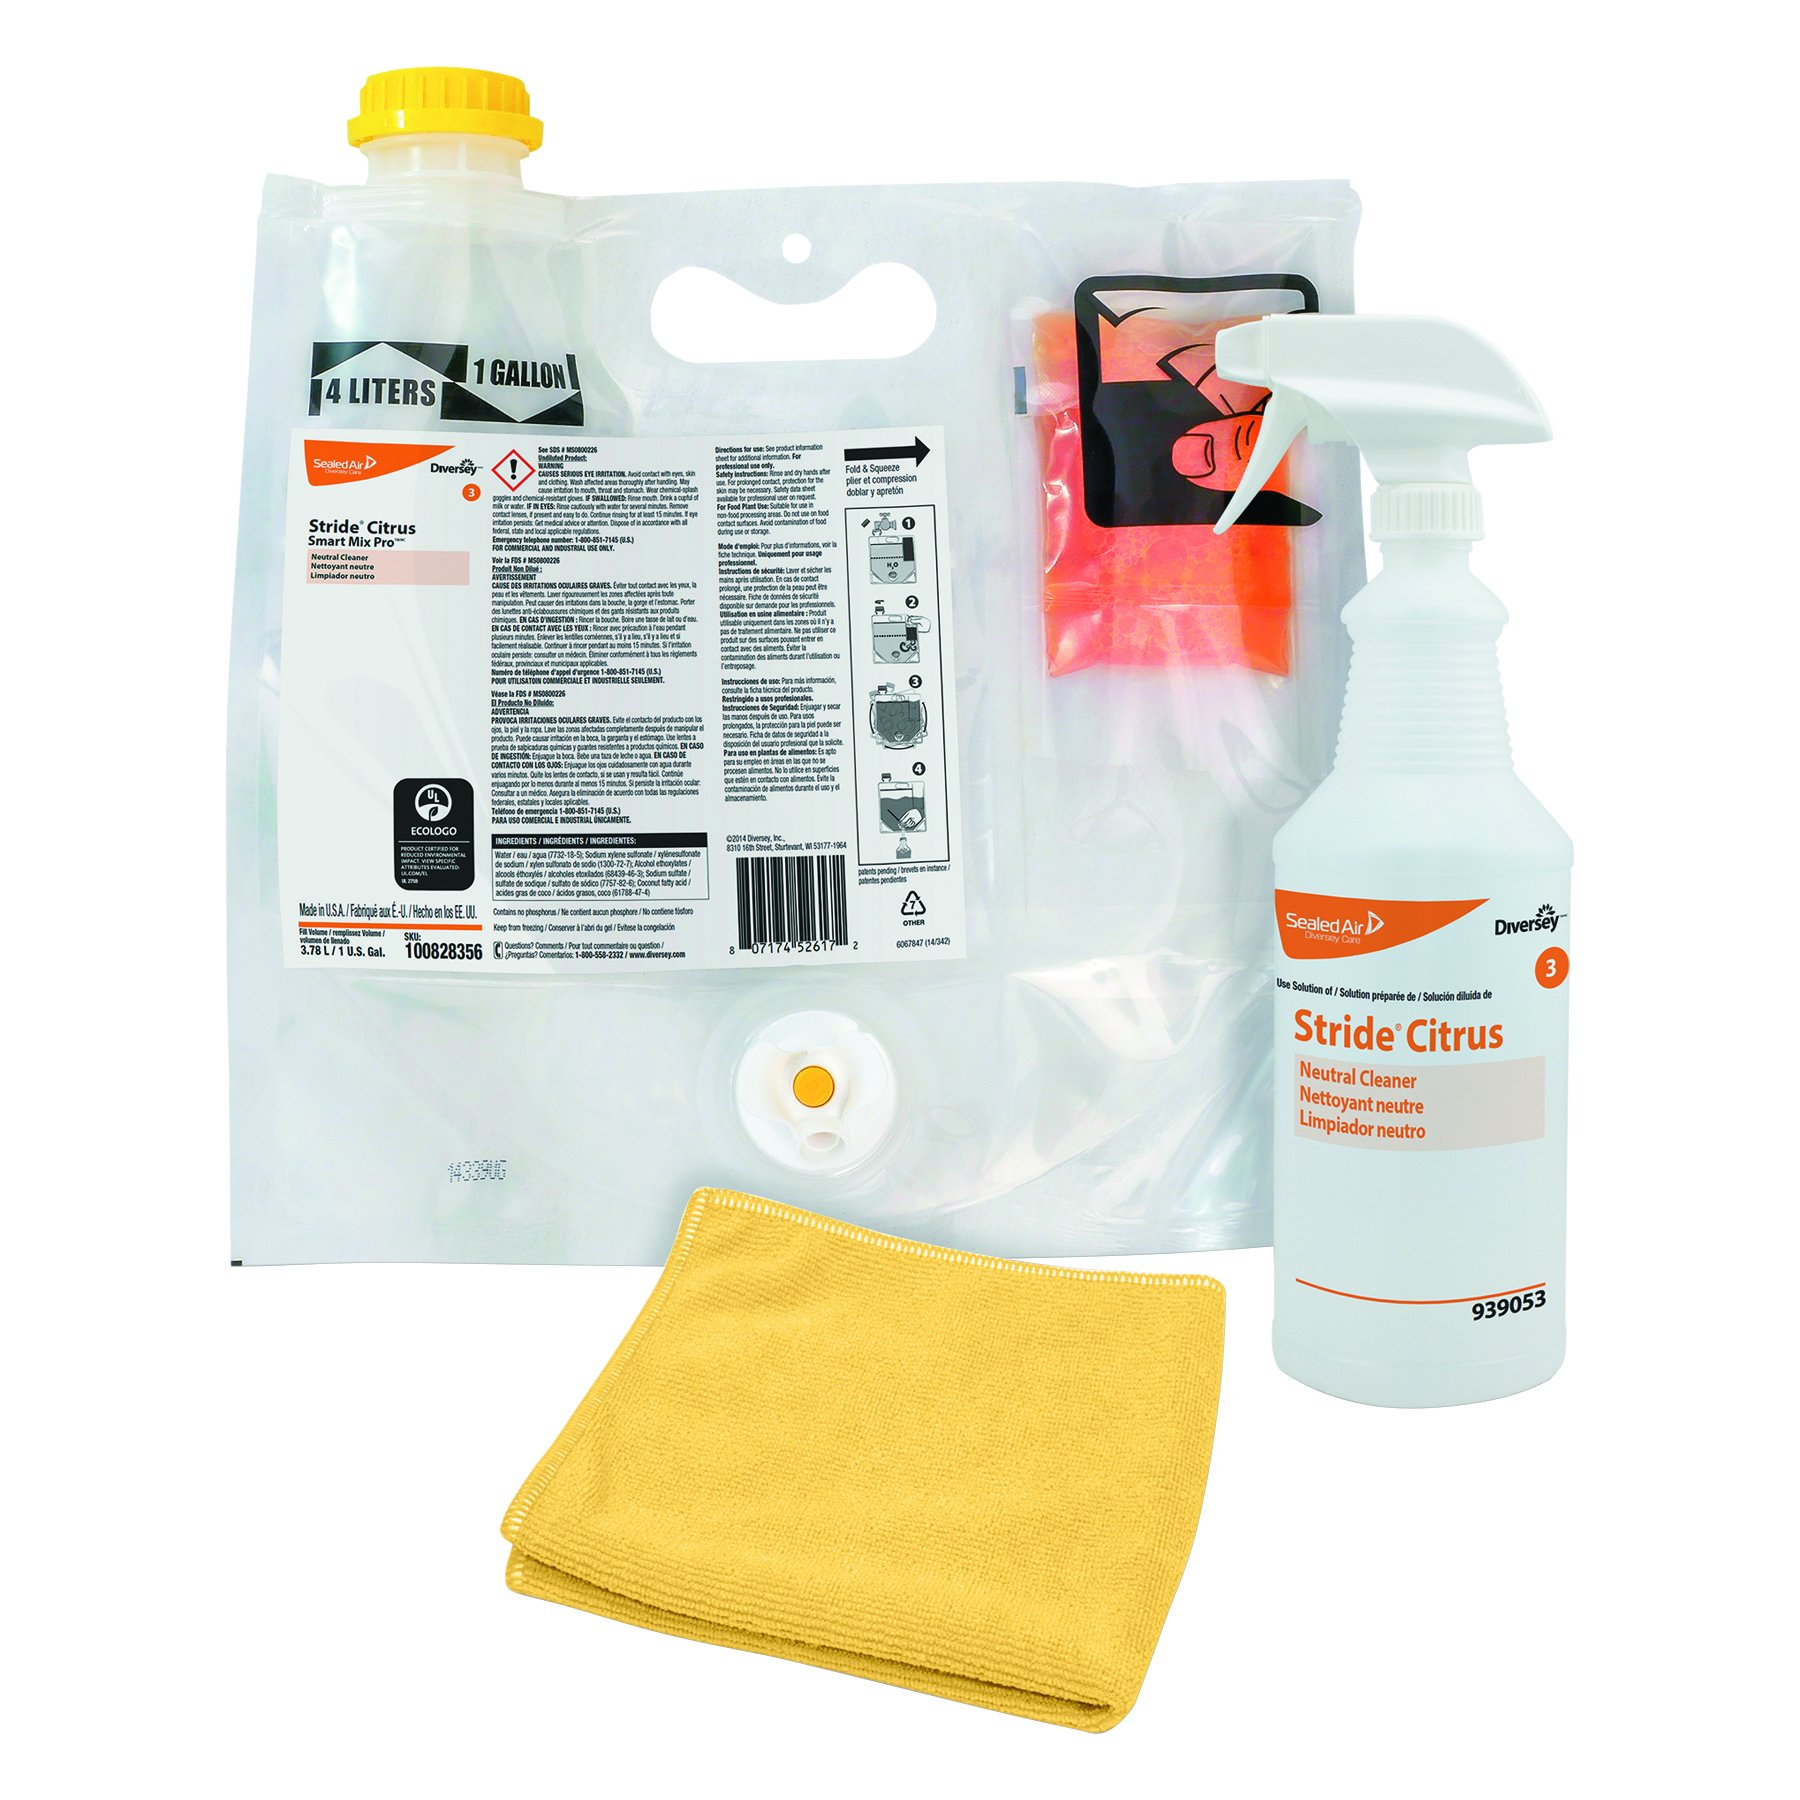 Diversey Stride Smart Mix Pro Neutral Cleaner Starter Kit - Citrus - The NEW Smartest Way to Clean - Includes 2 Smart Pouches = 8 x 1 Quart Bottles, 1 Empty Spray Bottle & Trigger, 1 Cloth, 2 Labels